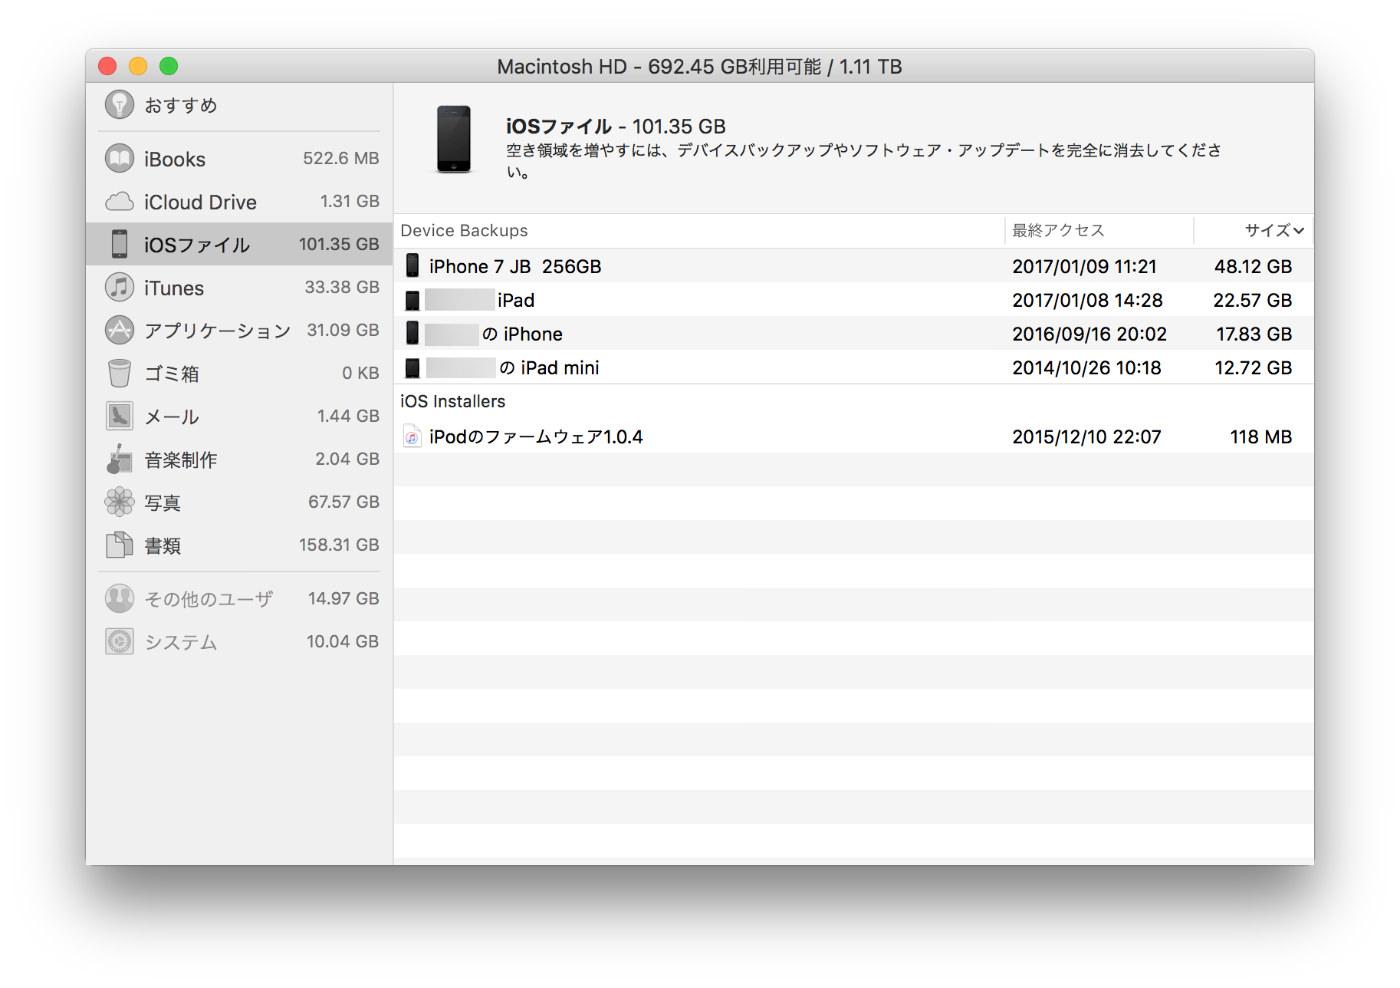 iMac 5K Retinaディスプレイモデル 管理画面-9